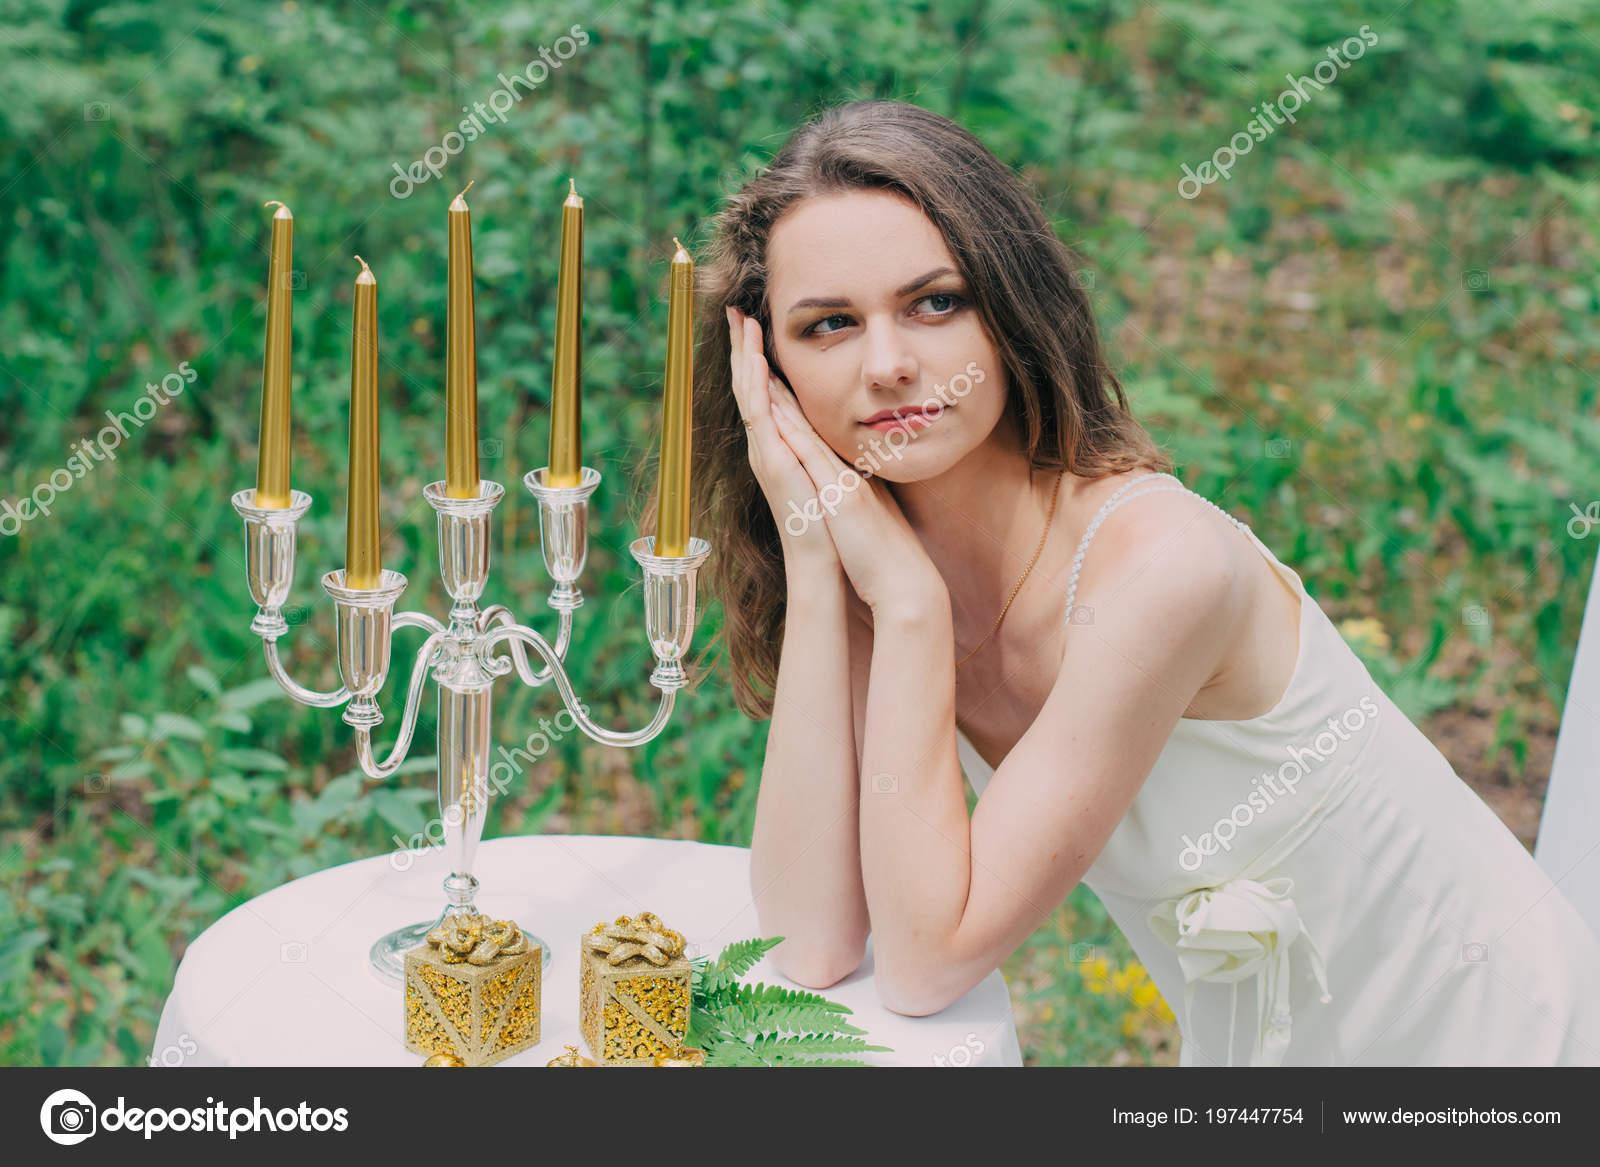 6b19a59a0470 Muy hermosa chica fotografiada en la naturaleza con flores frescas ...